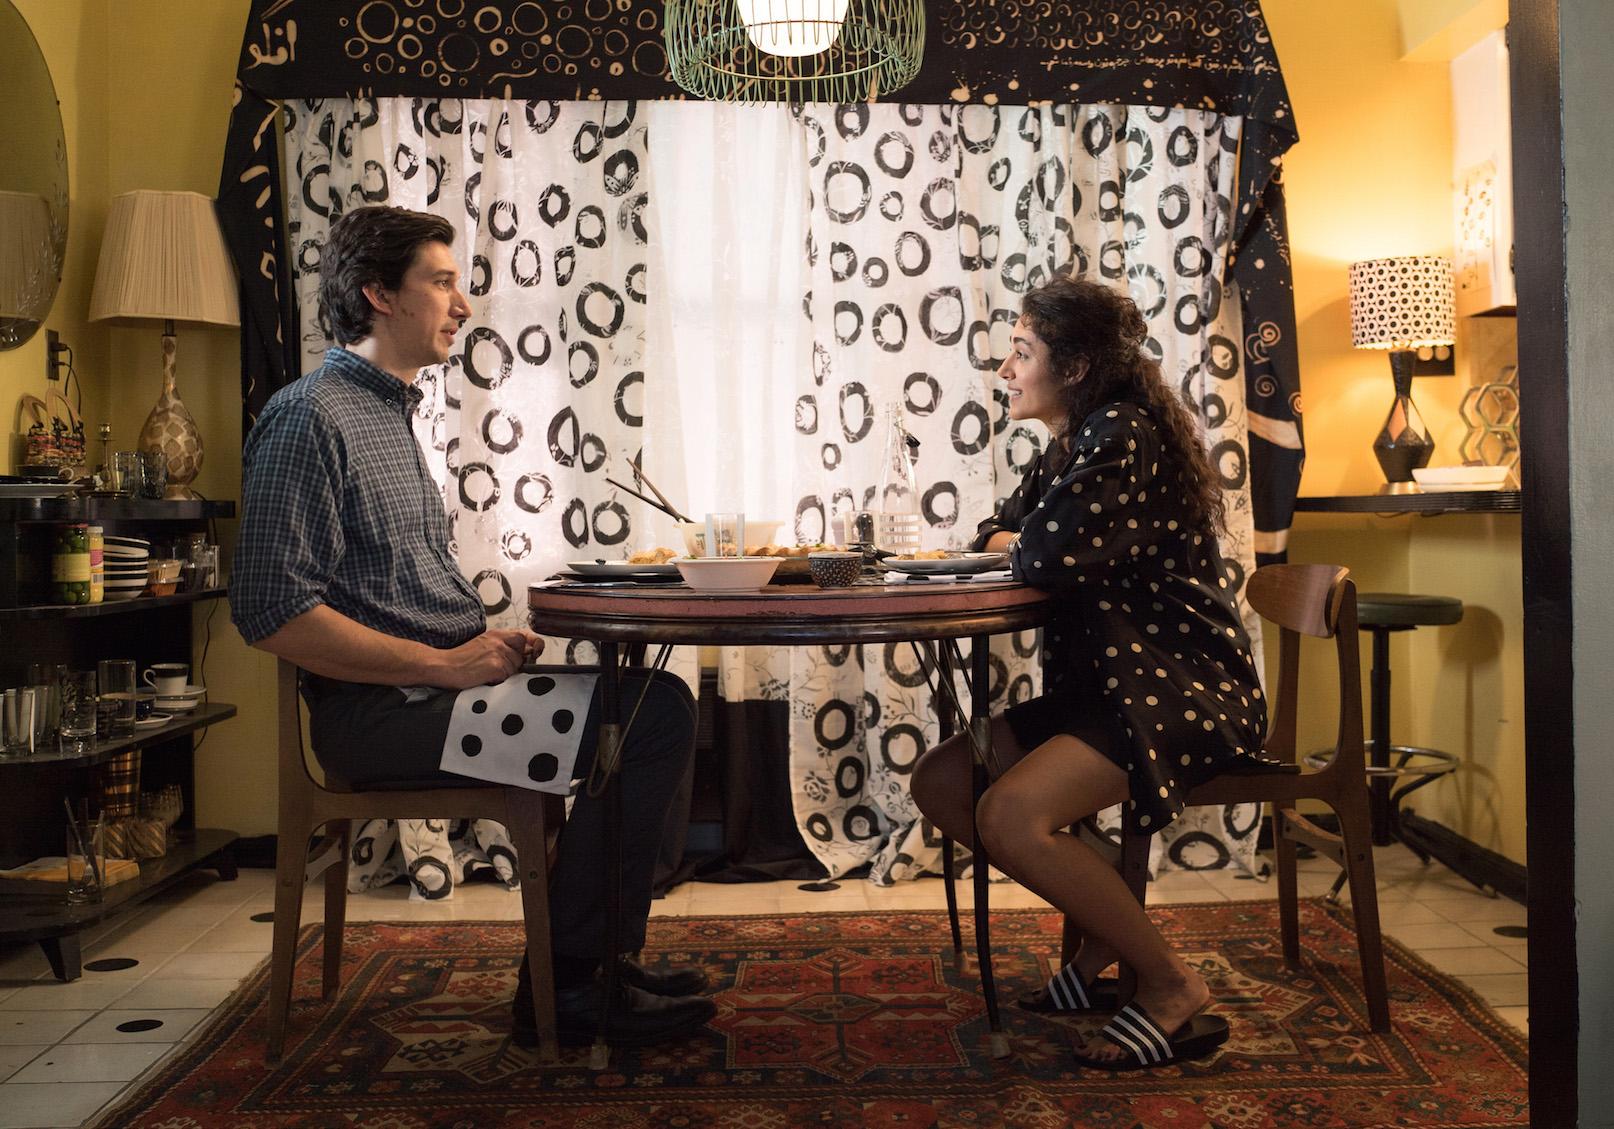 "Adam Driver as Paterson, Golshifteh Farahani as Laura in ""Paterson."" Credit: Mary Cybulski/Amazon Studios & Bleeker Street © 2016 Amazon Studios & Bleecker Street"